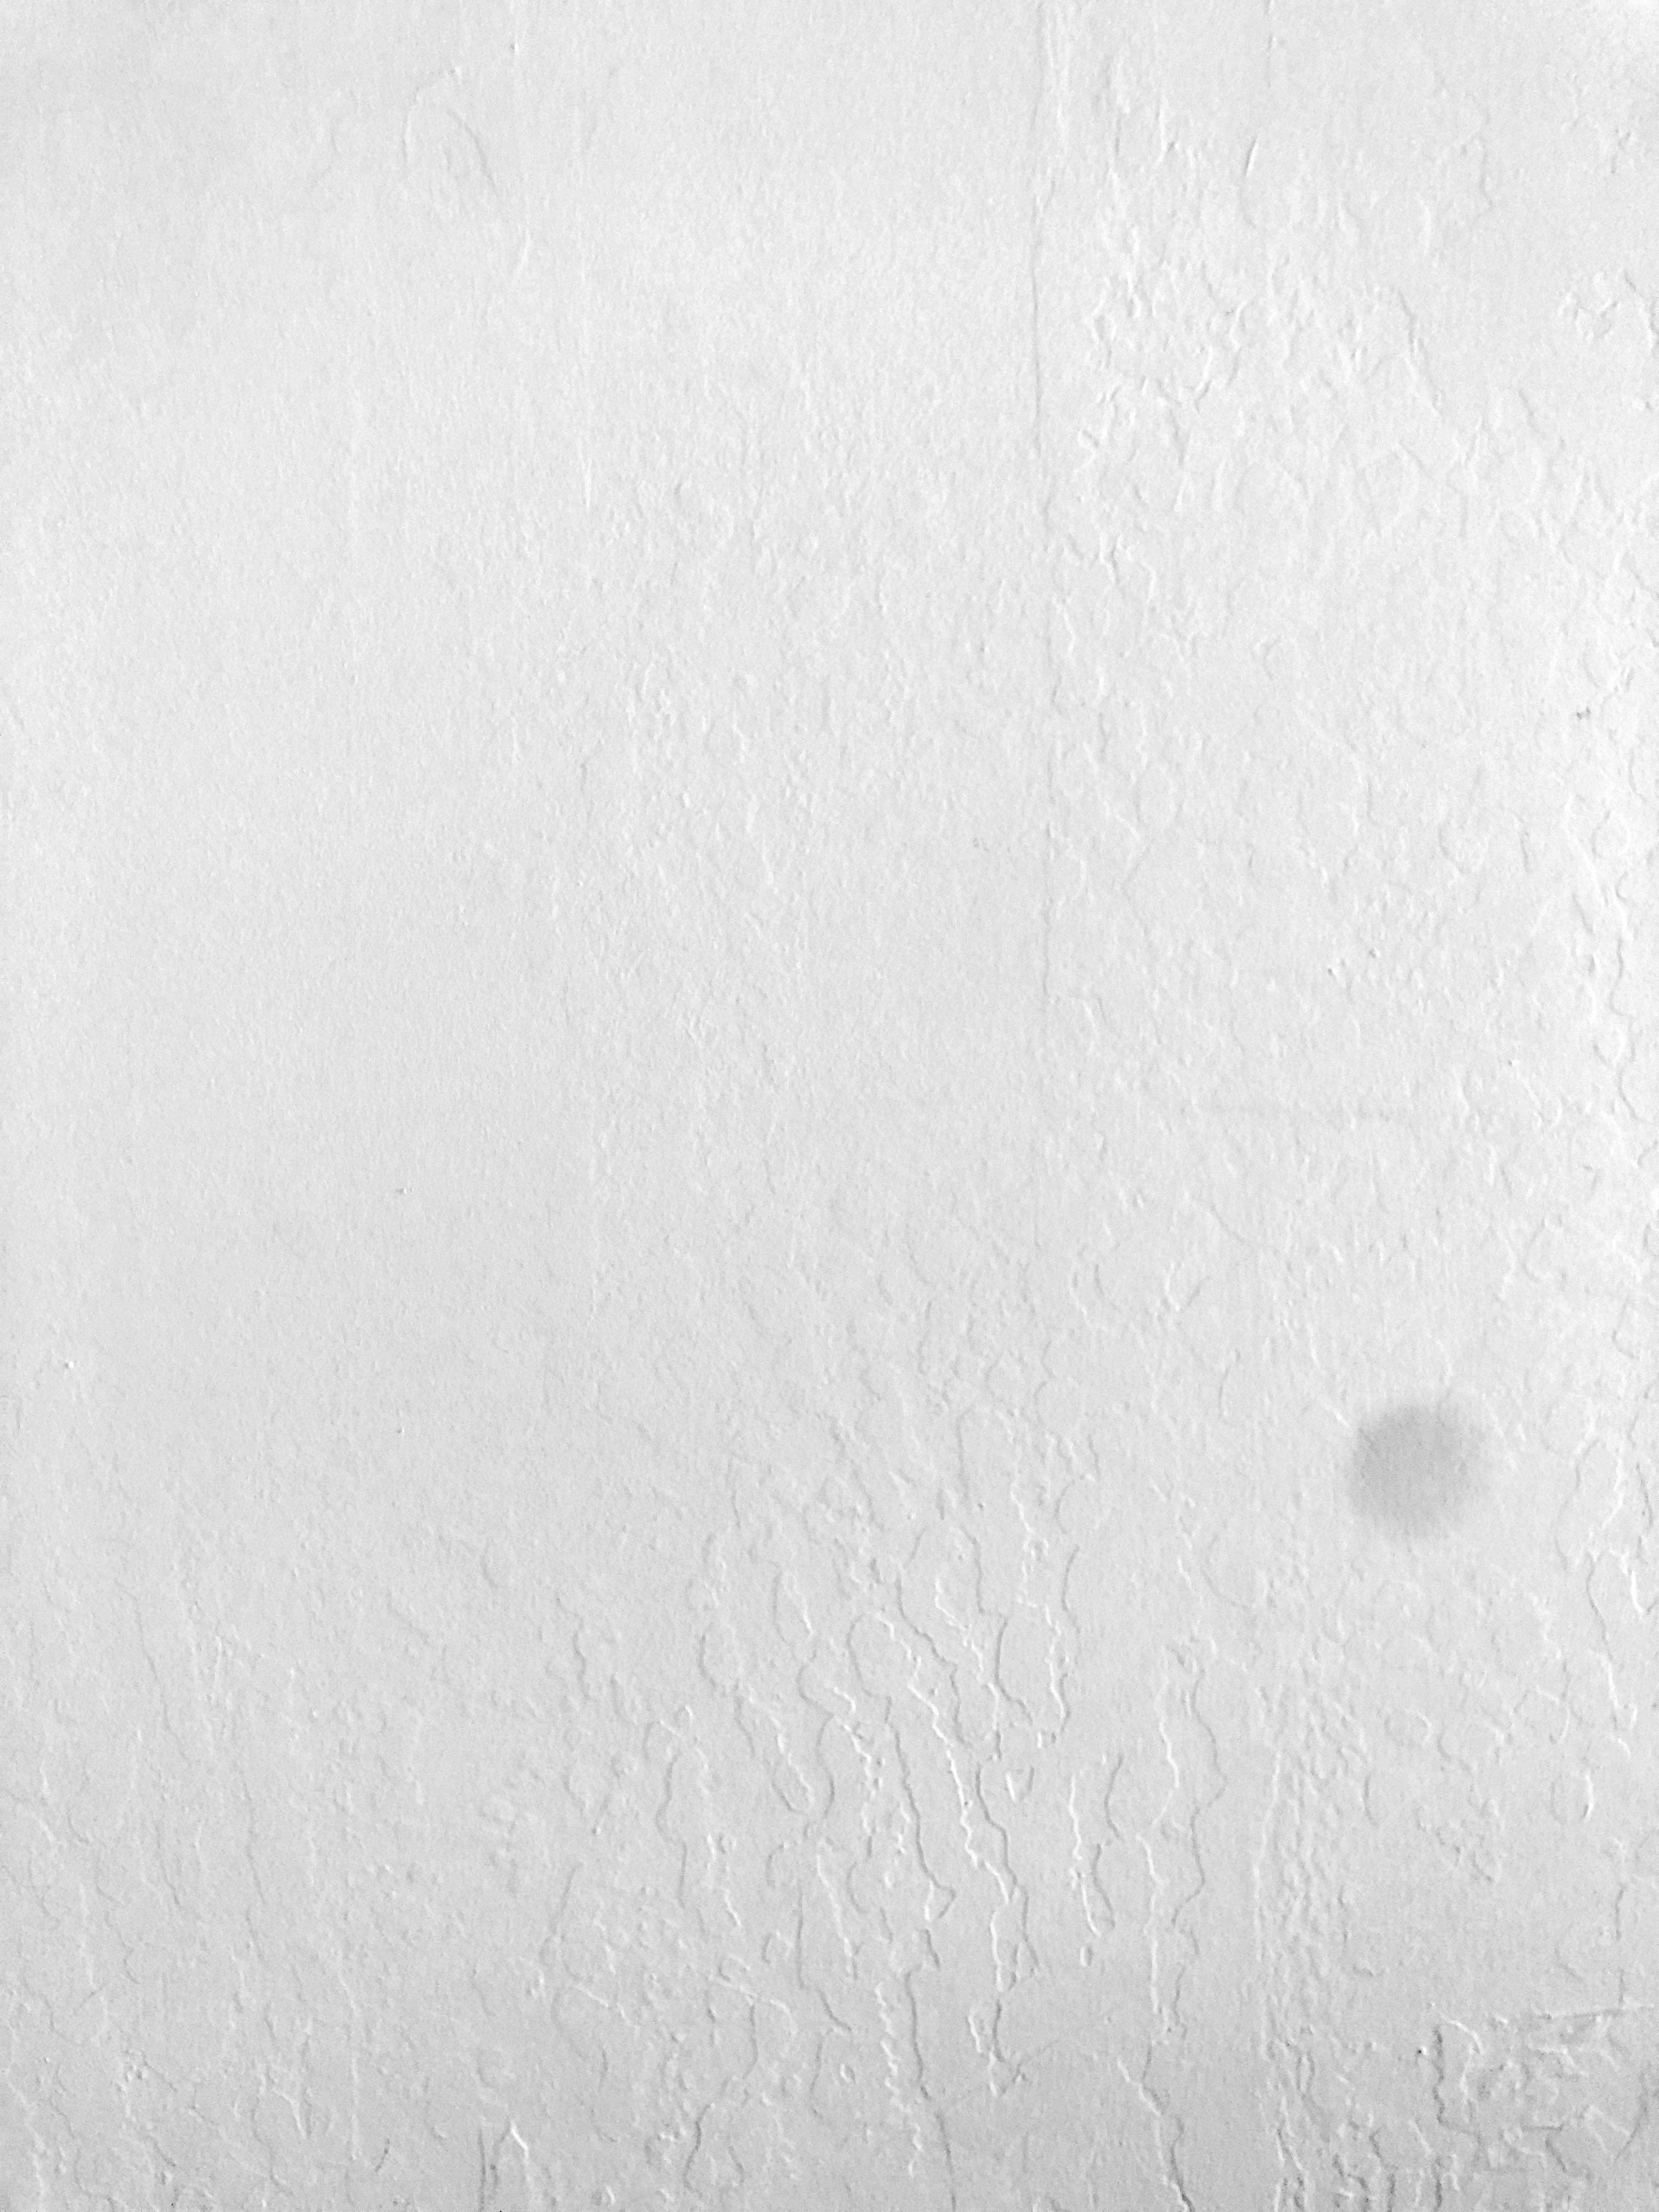 iphone x sensor dust.jpg